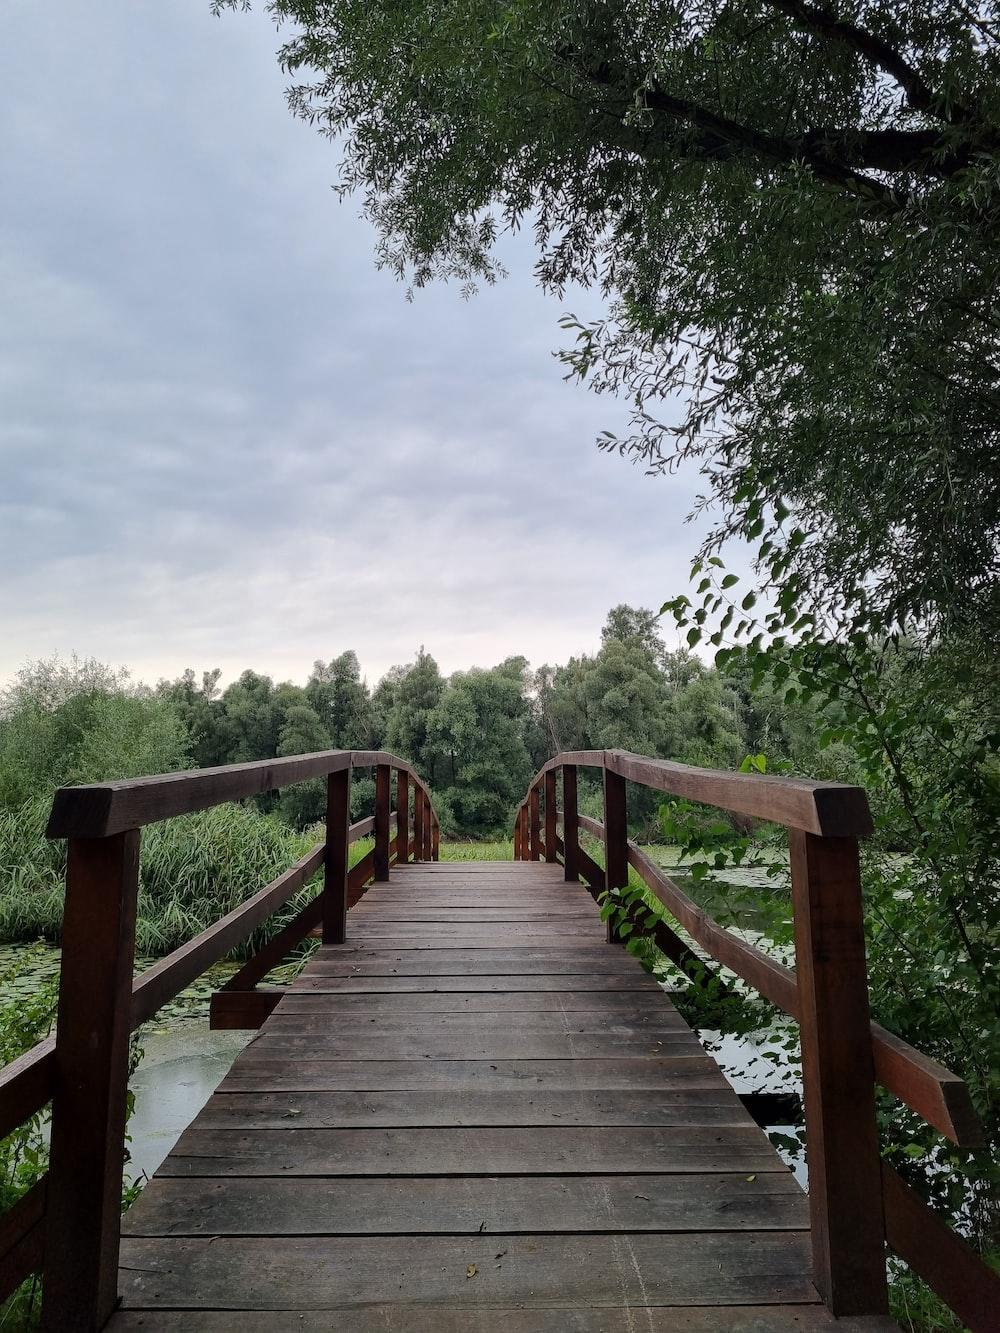 brown wooden bridge near green trees during daytime